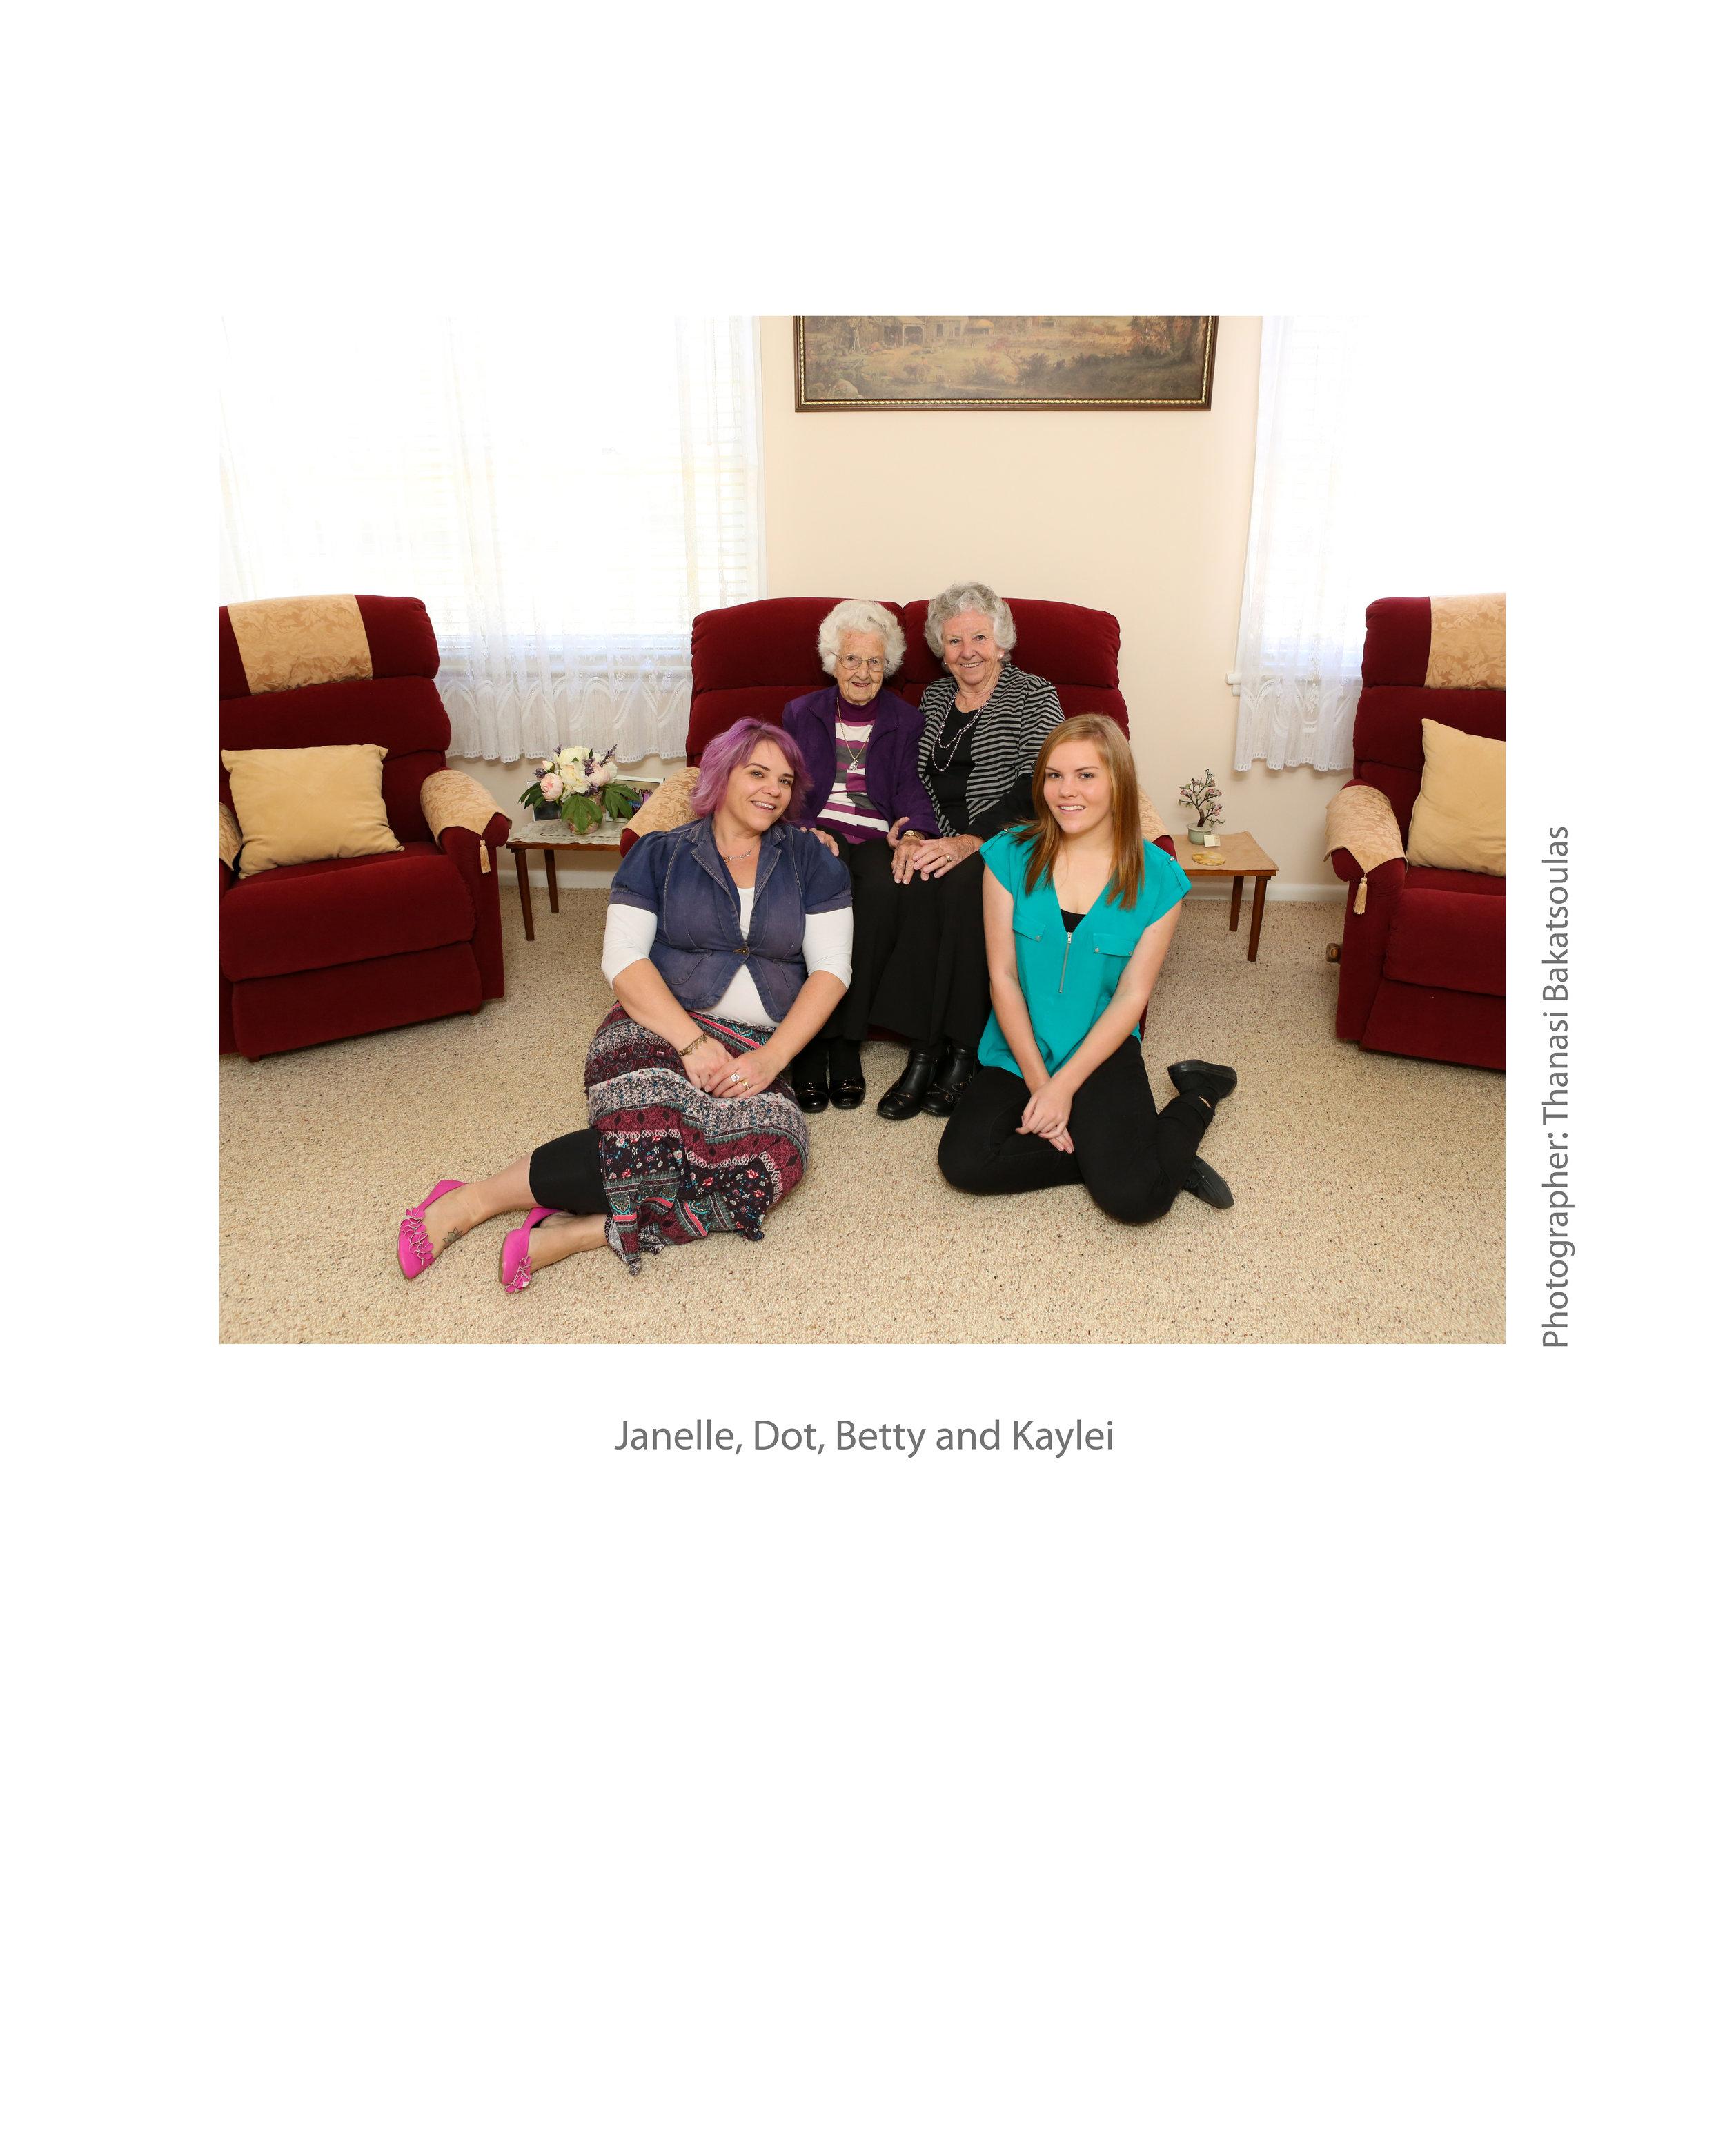 Janelle, Dot, Betty and Kaylei.jpg